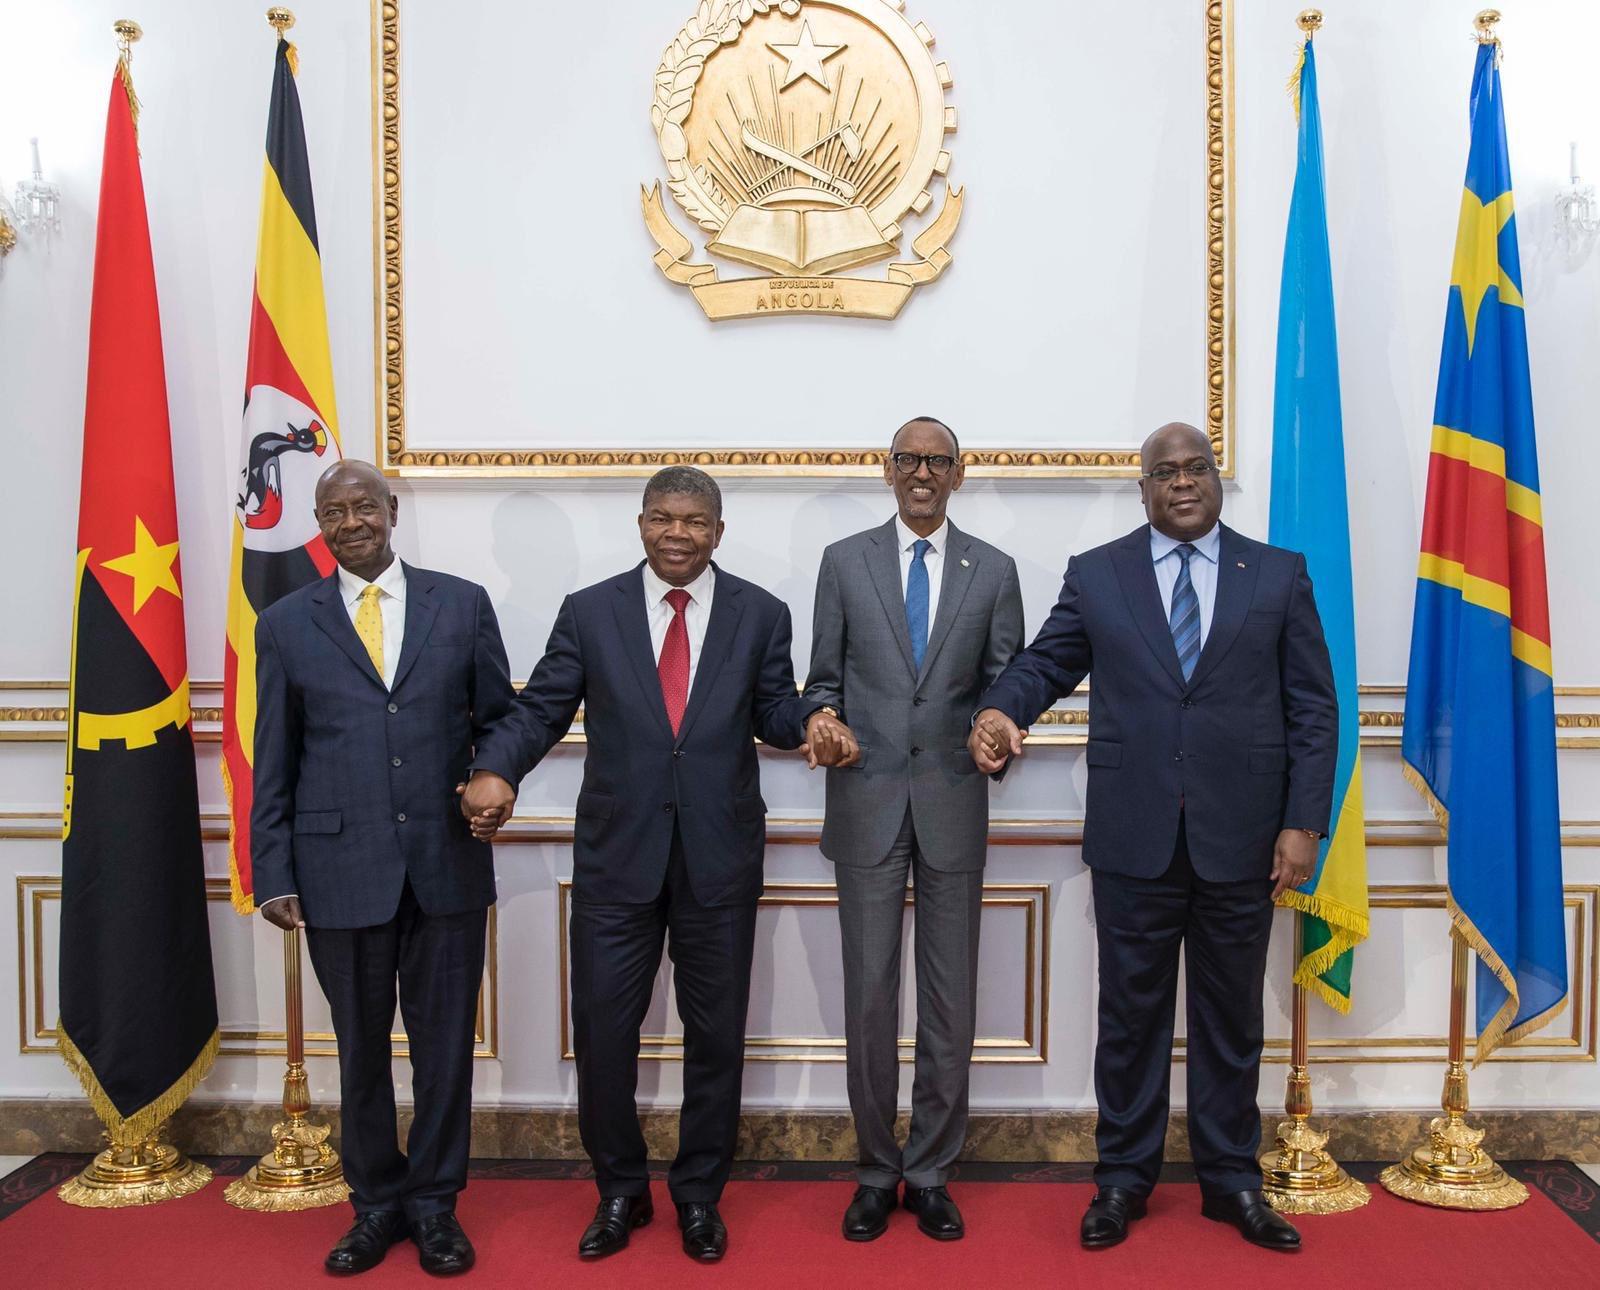 From left, President Museveni of Uganda, president João Lourenço of Angola, president Kagame of Rwanda and president Félix Tshisekedi of Democratic Republic of Congo.